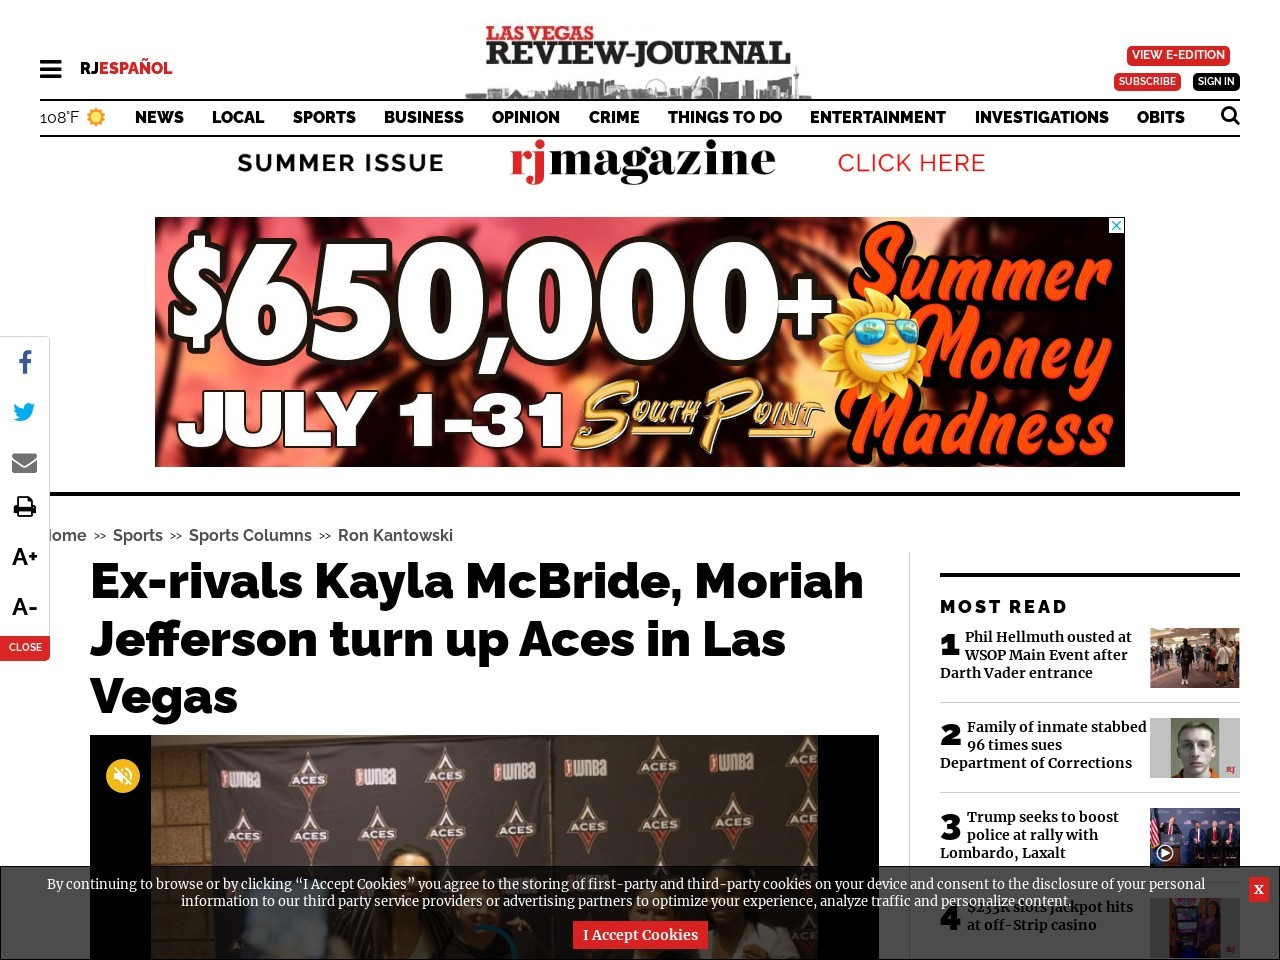 Ex-rivals Kayla McBride, Moriah Jefferson turn up Aces in Las Vegas